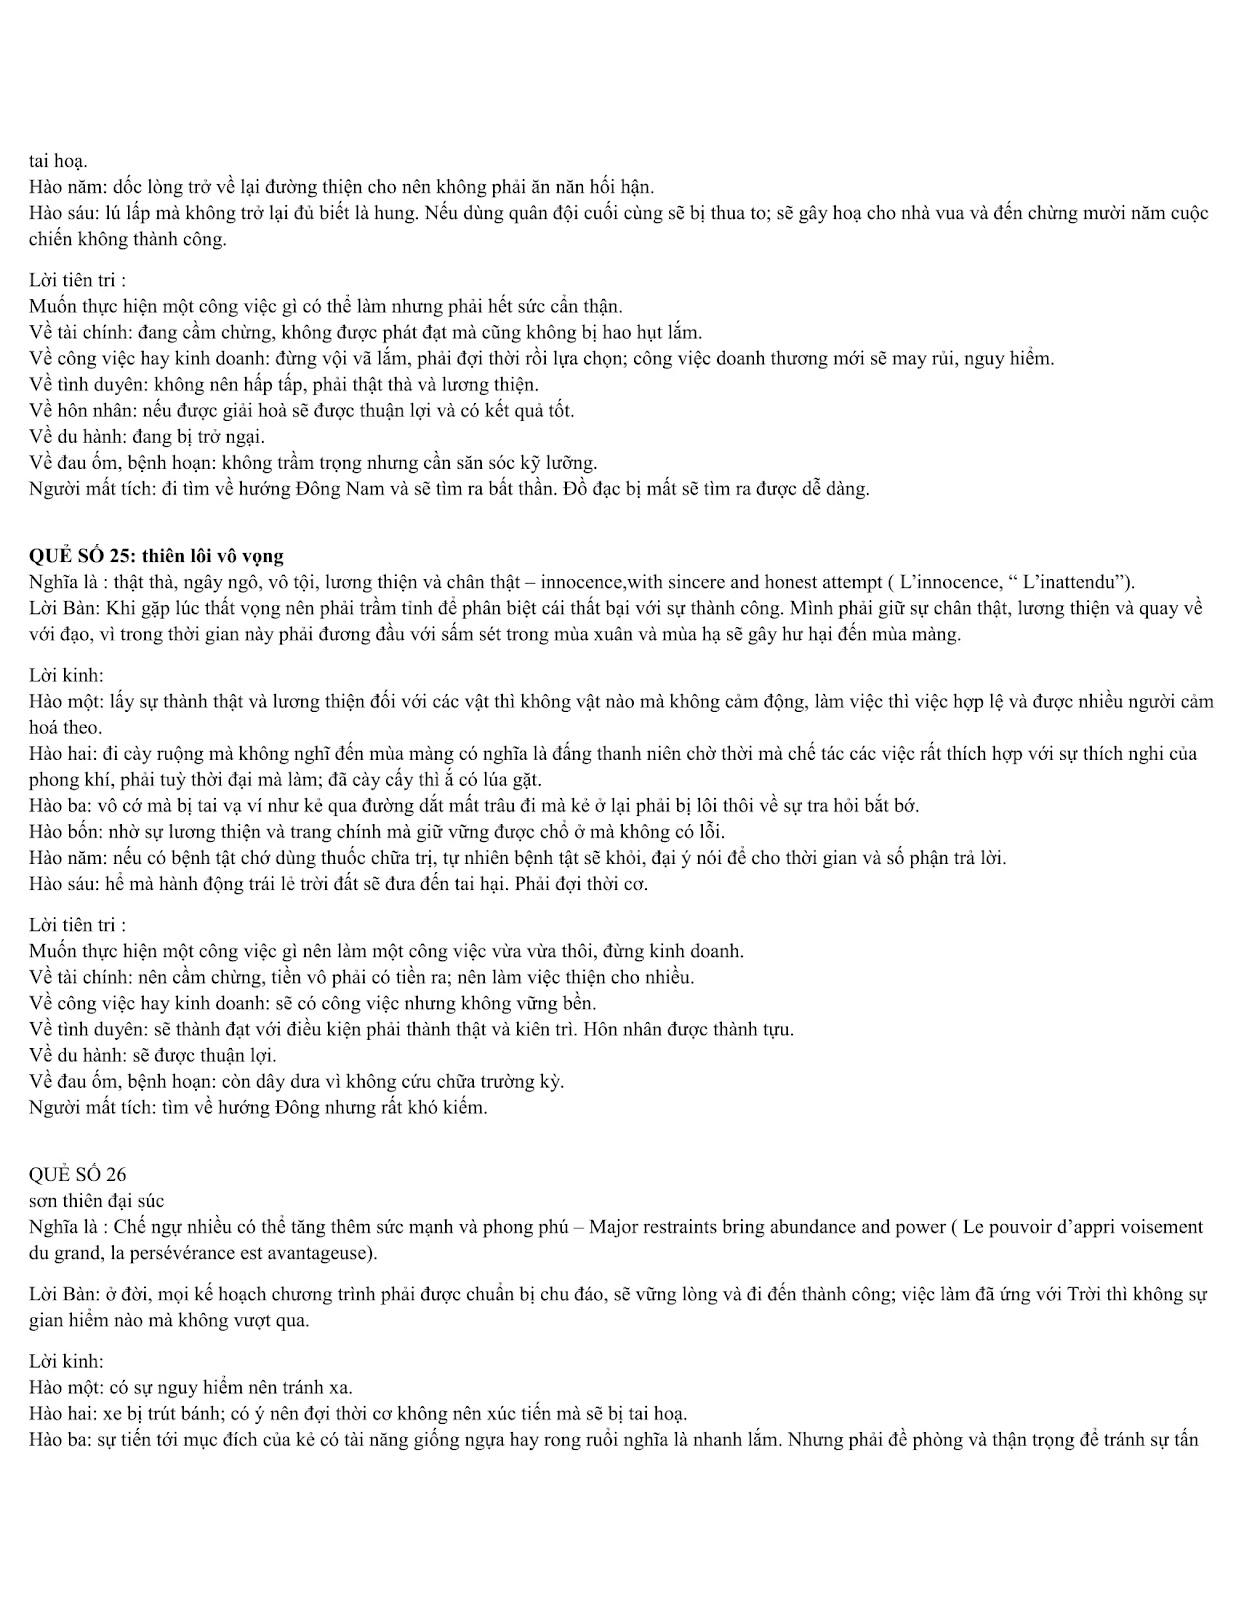 QUẺ SỐ 1-13.jpg